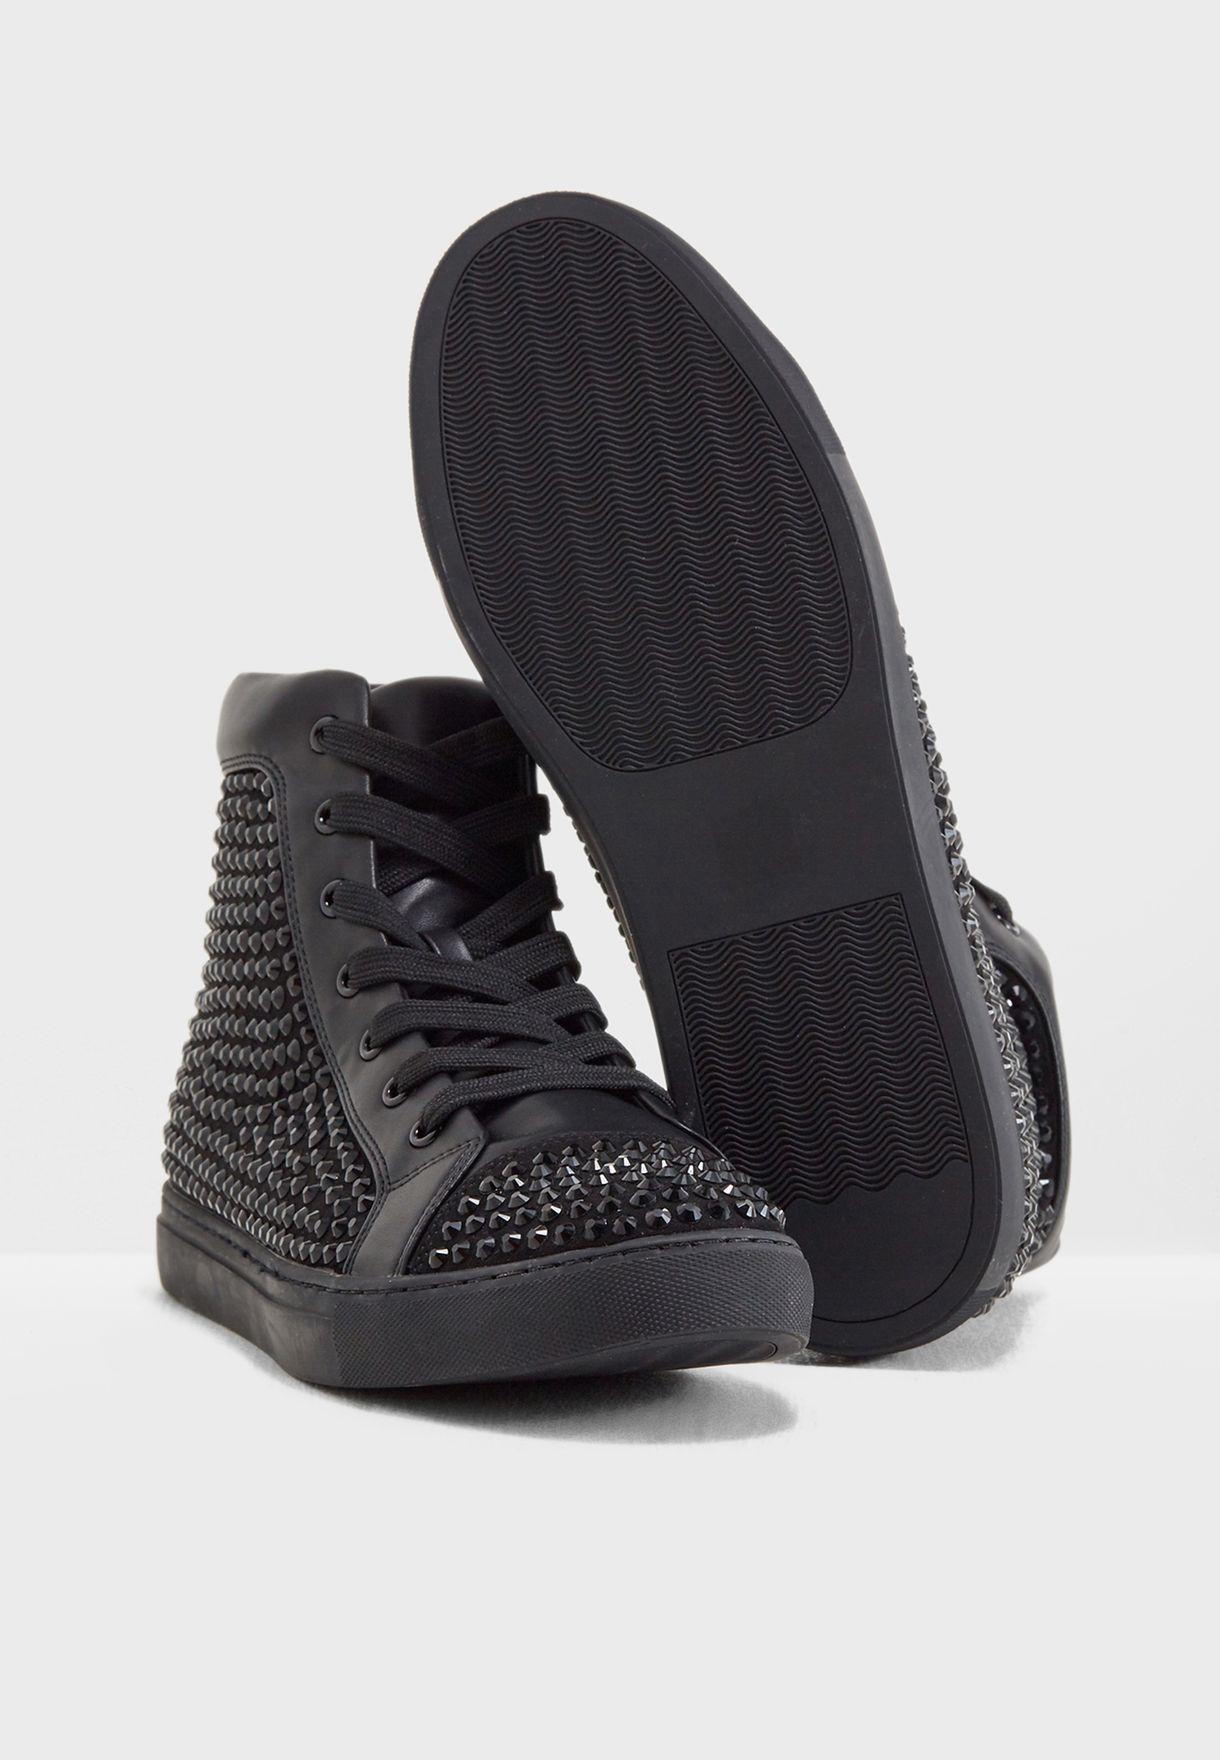 d107c2a27df Shop Steve Madden black Crescent Sneakers CRESCENT for Men in ...